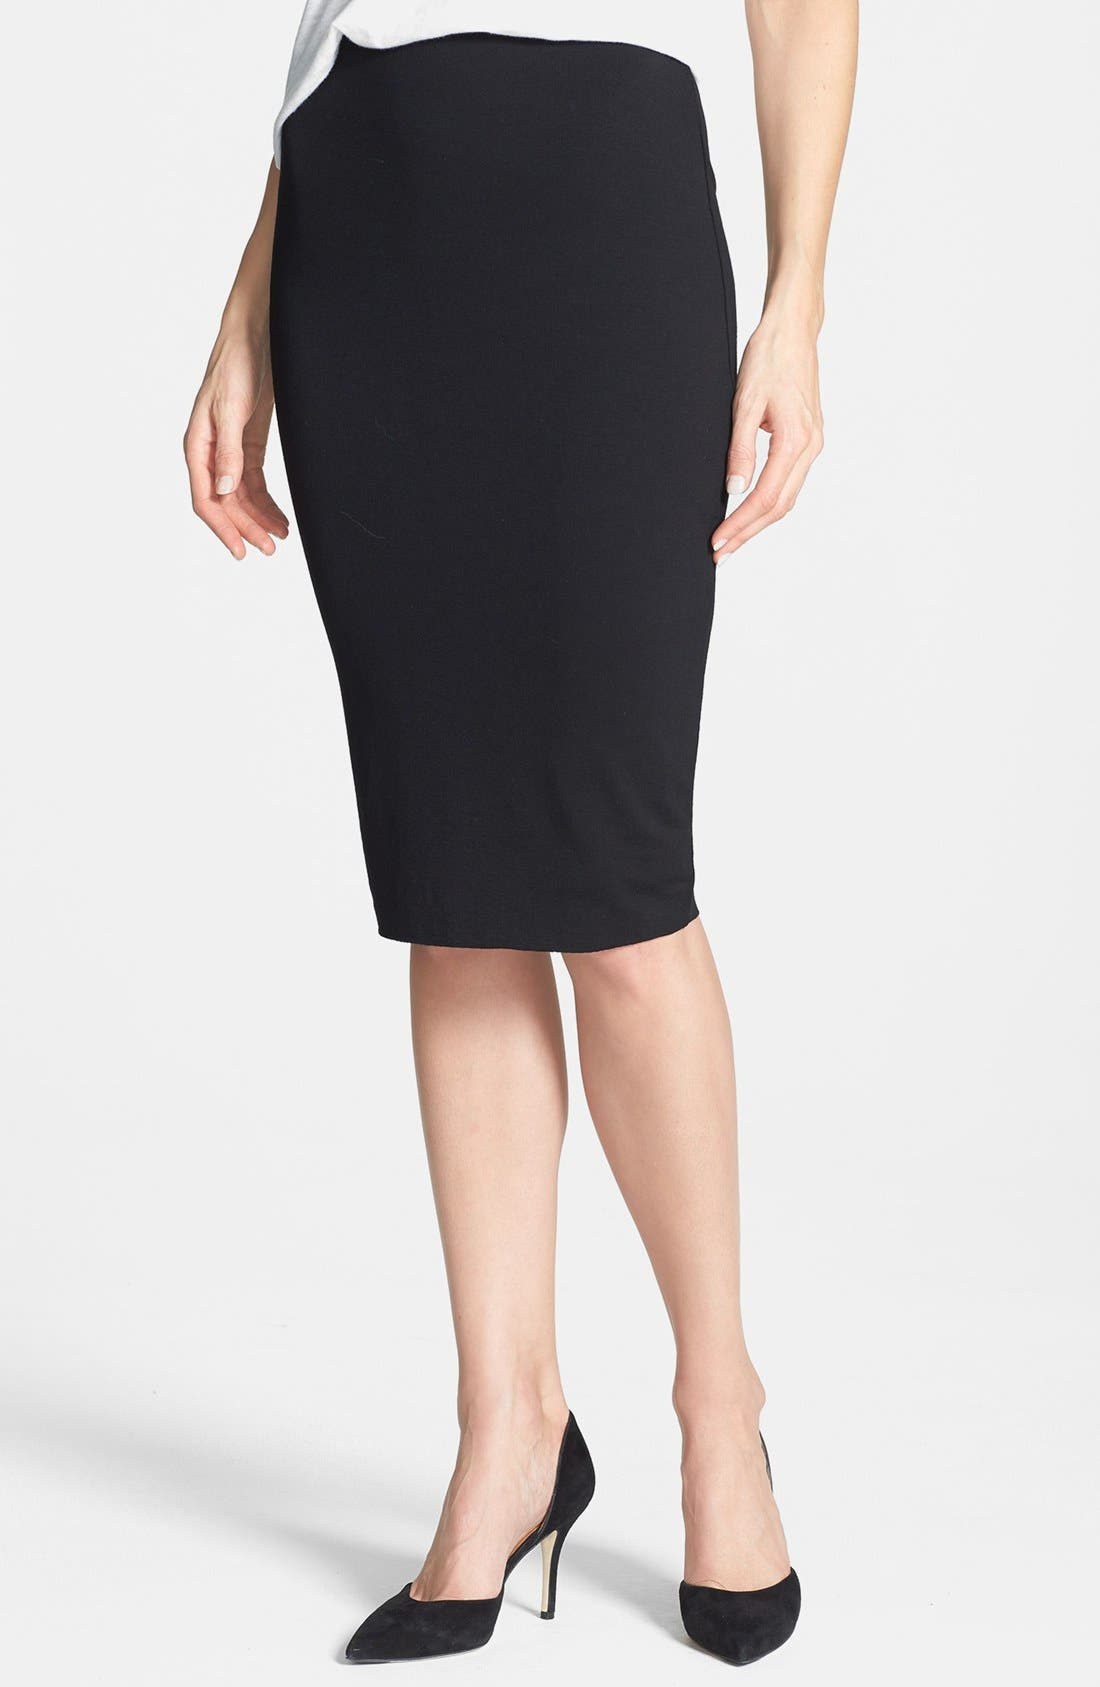 Vince Camuto Stretch Knit Midi Tube Skirt (Petite)